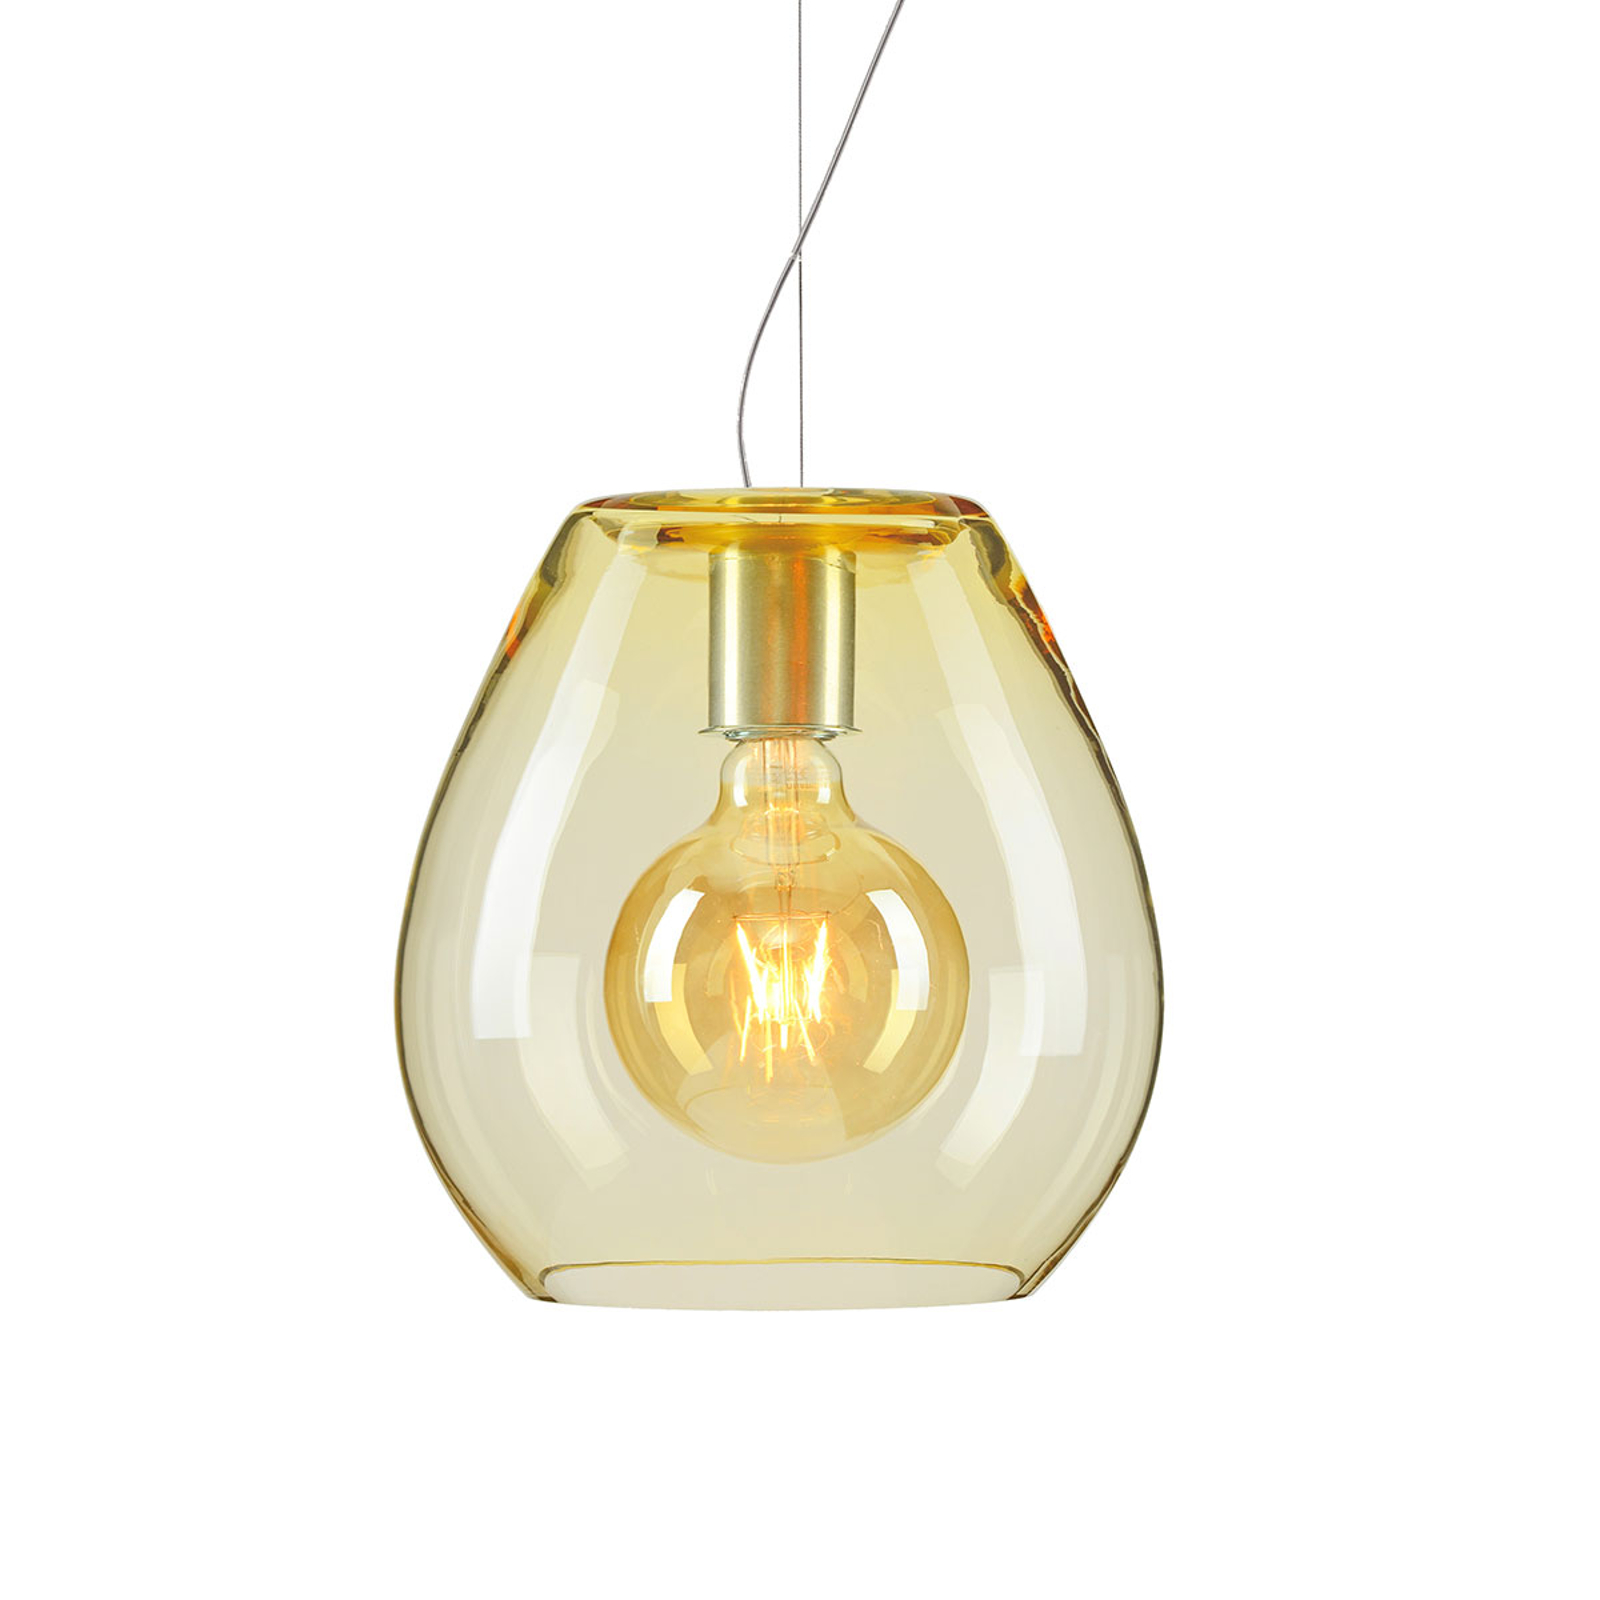 Casablanca Bagan Evolution hanglamp, whiskey